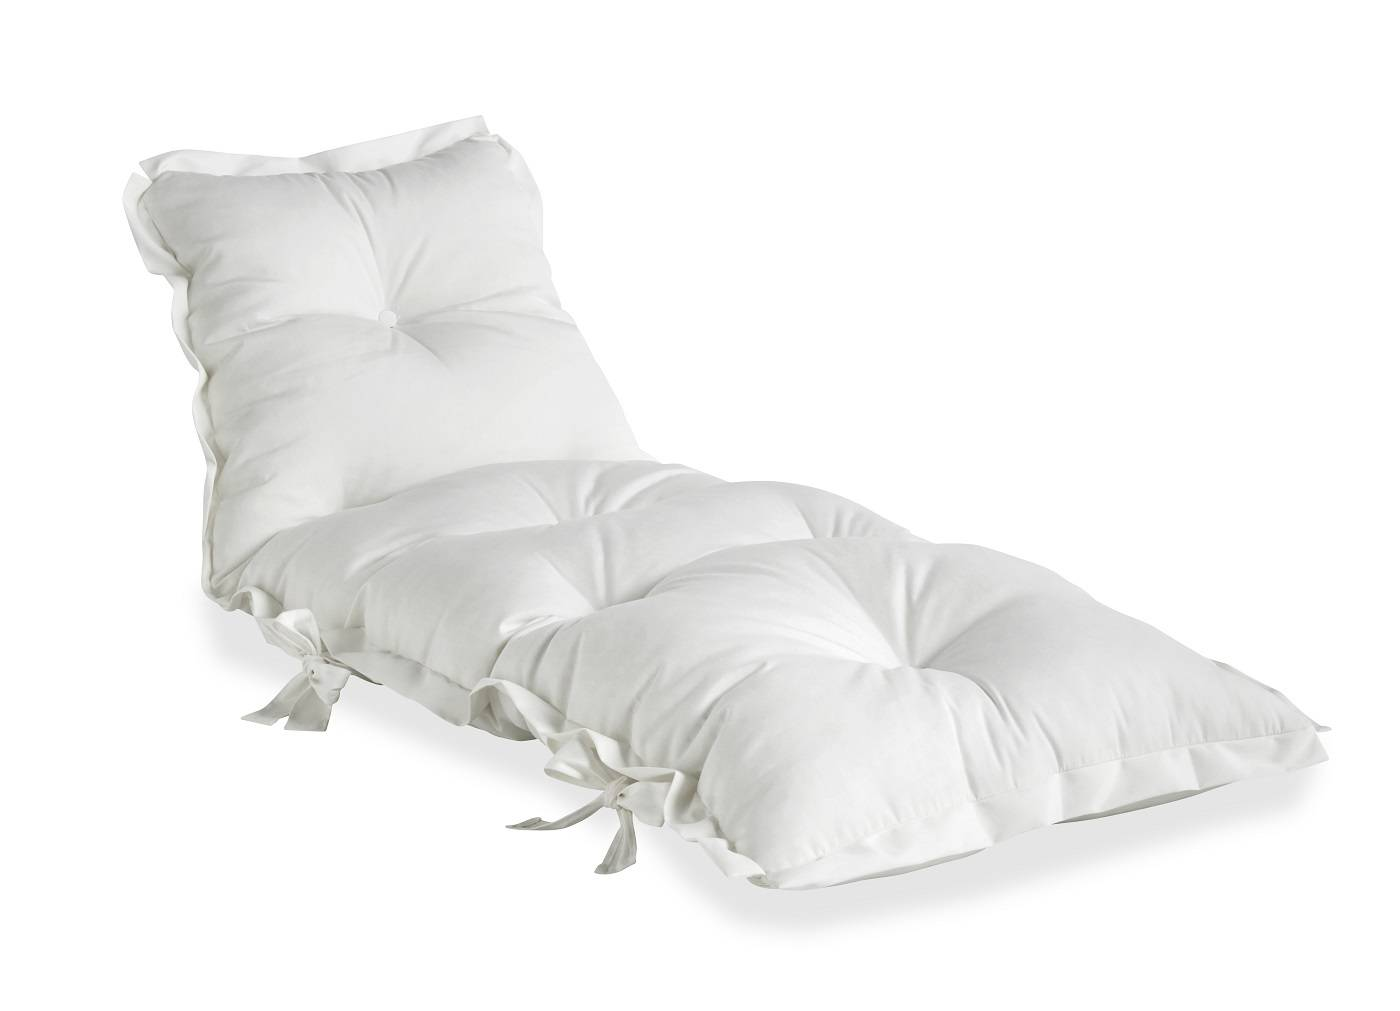 Unoliving Sit&Sleep Futon madras/stol Outdoor - Hvid